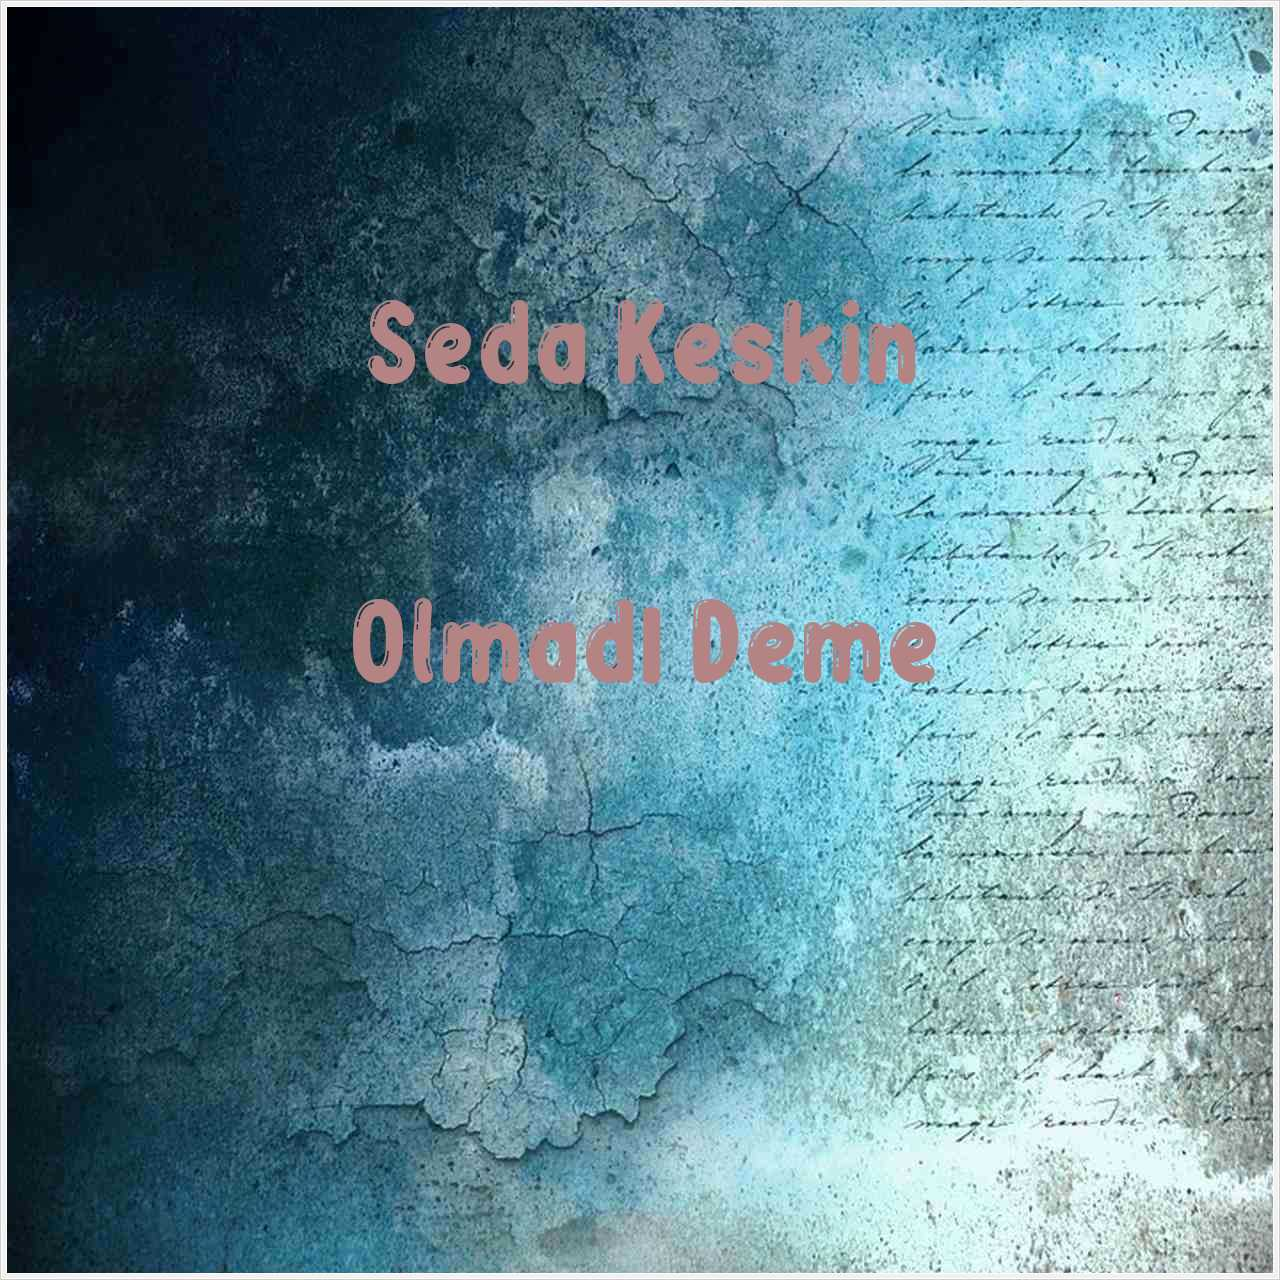 دانلود آهنگ جدید Seda Keskin به نام Olmadı Deme